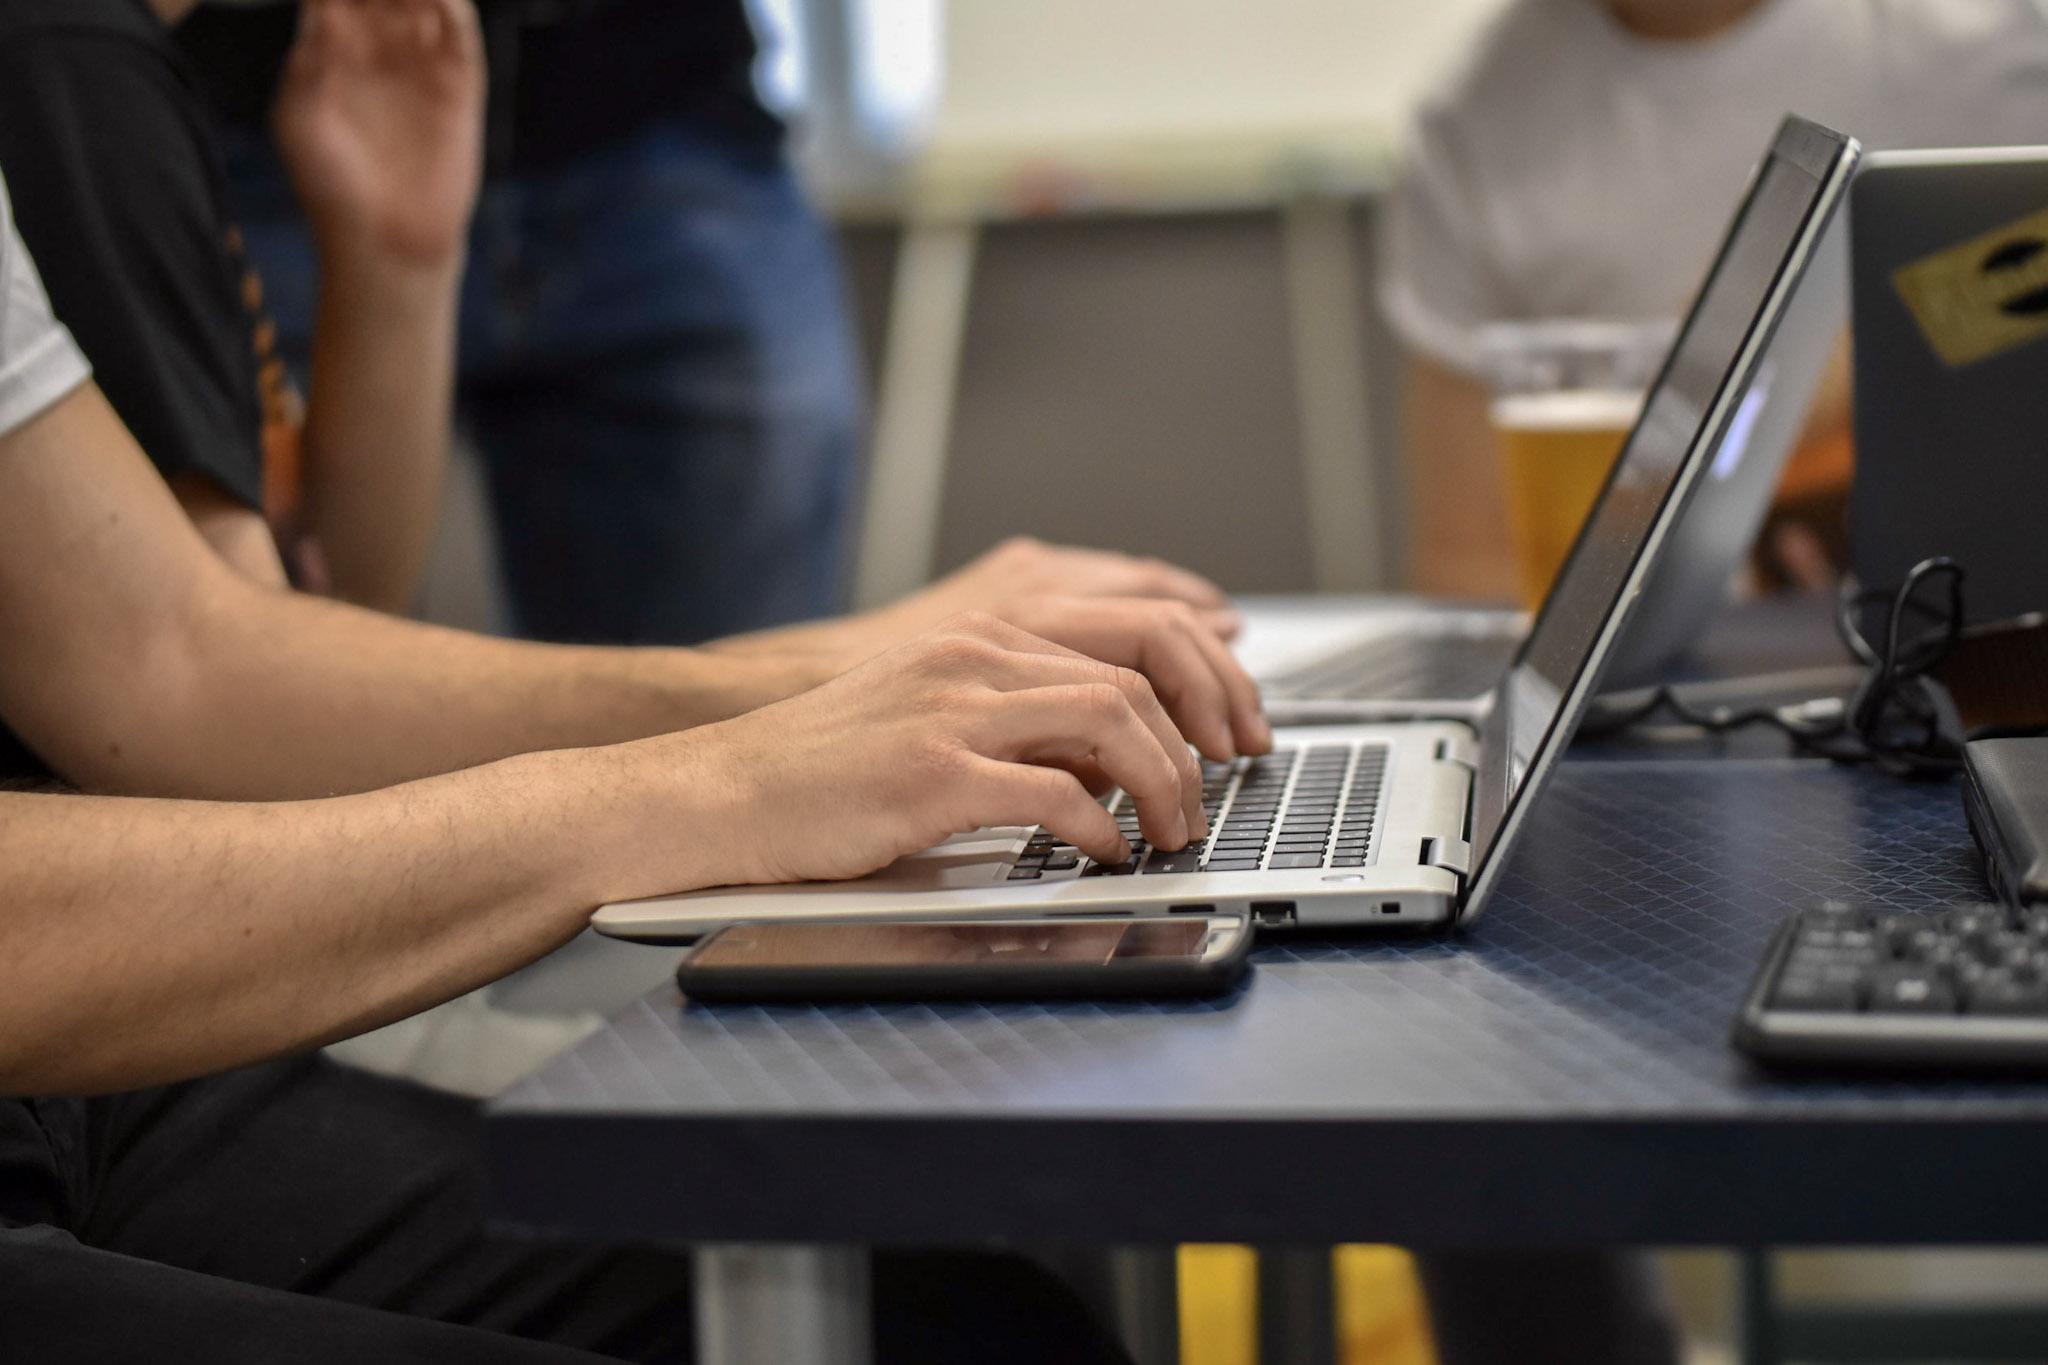 Hacking the news datathon